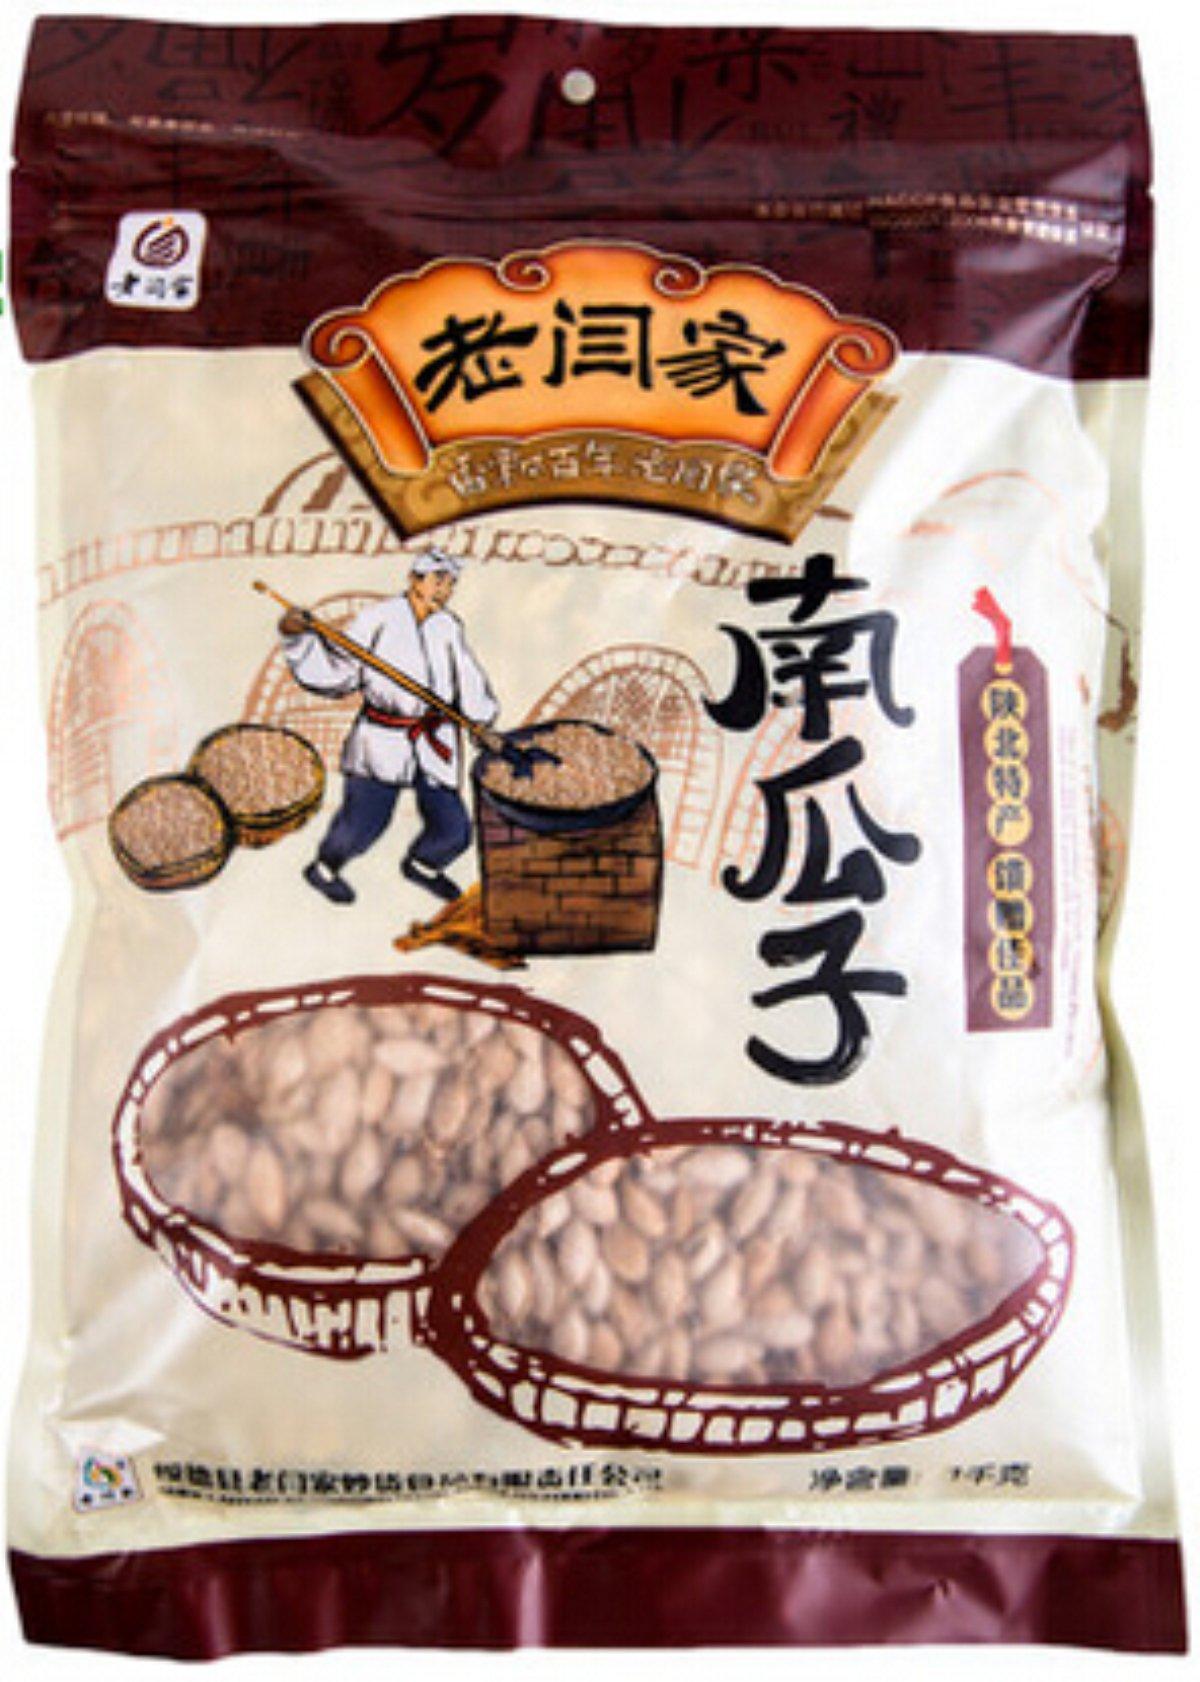 Helen Ou@shanbei Specialty: Lao Yan Jia Salt Baked Pumpkin Seeds or Nan Gua Zi 1000g/35.27oz/2.2lb